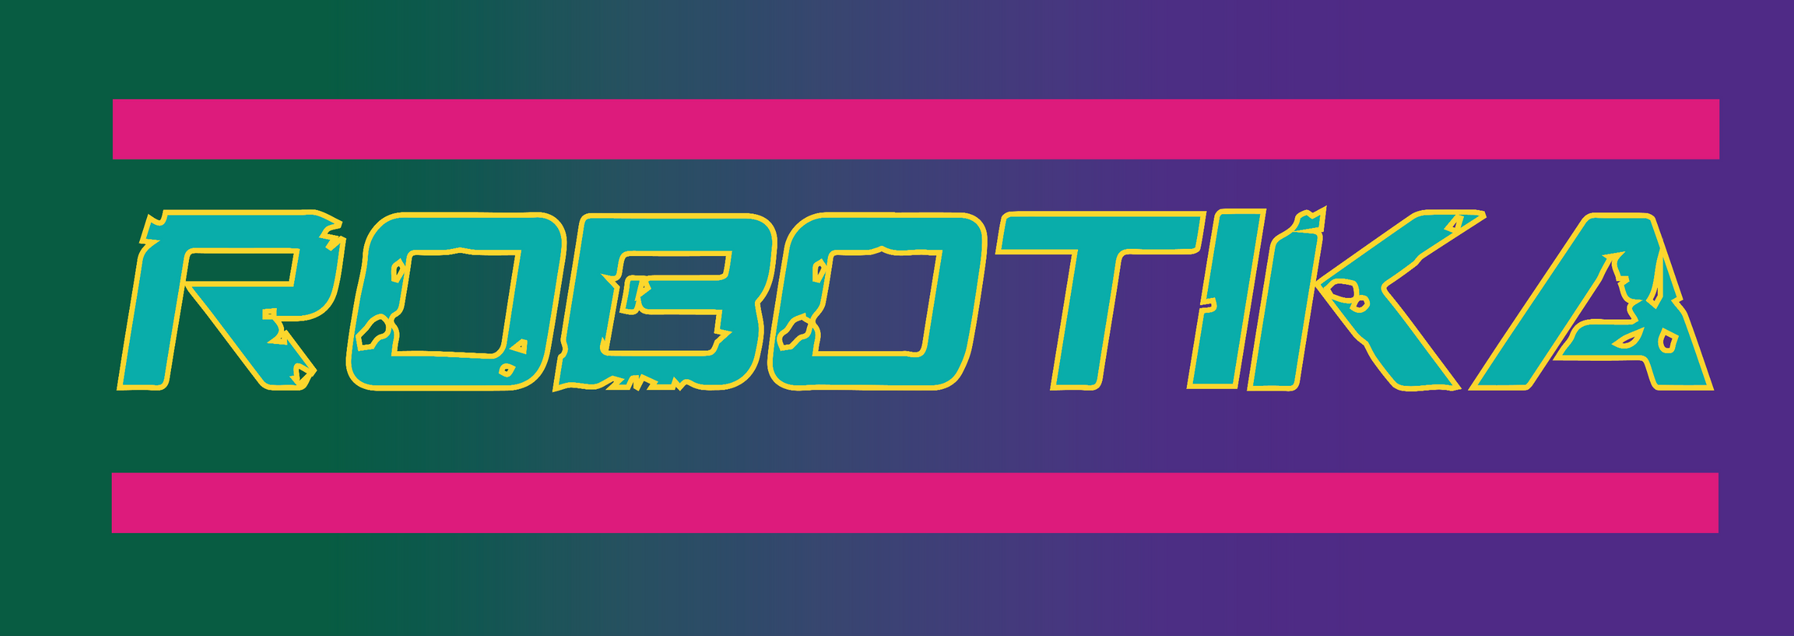 ROBOTIKA_2018_Artboard 5_edited.png